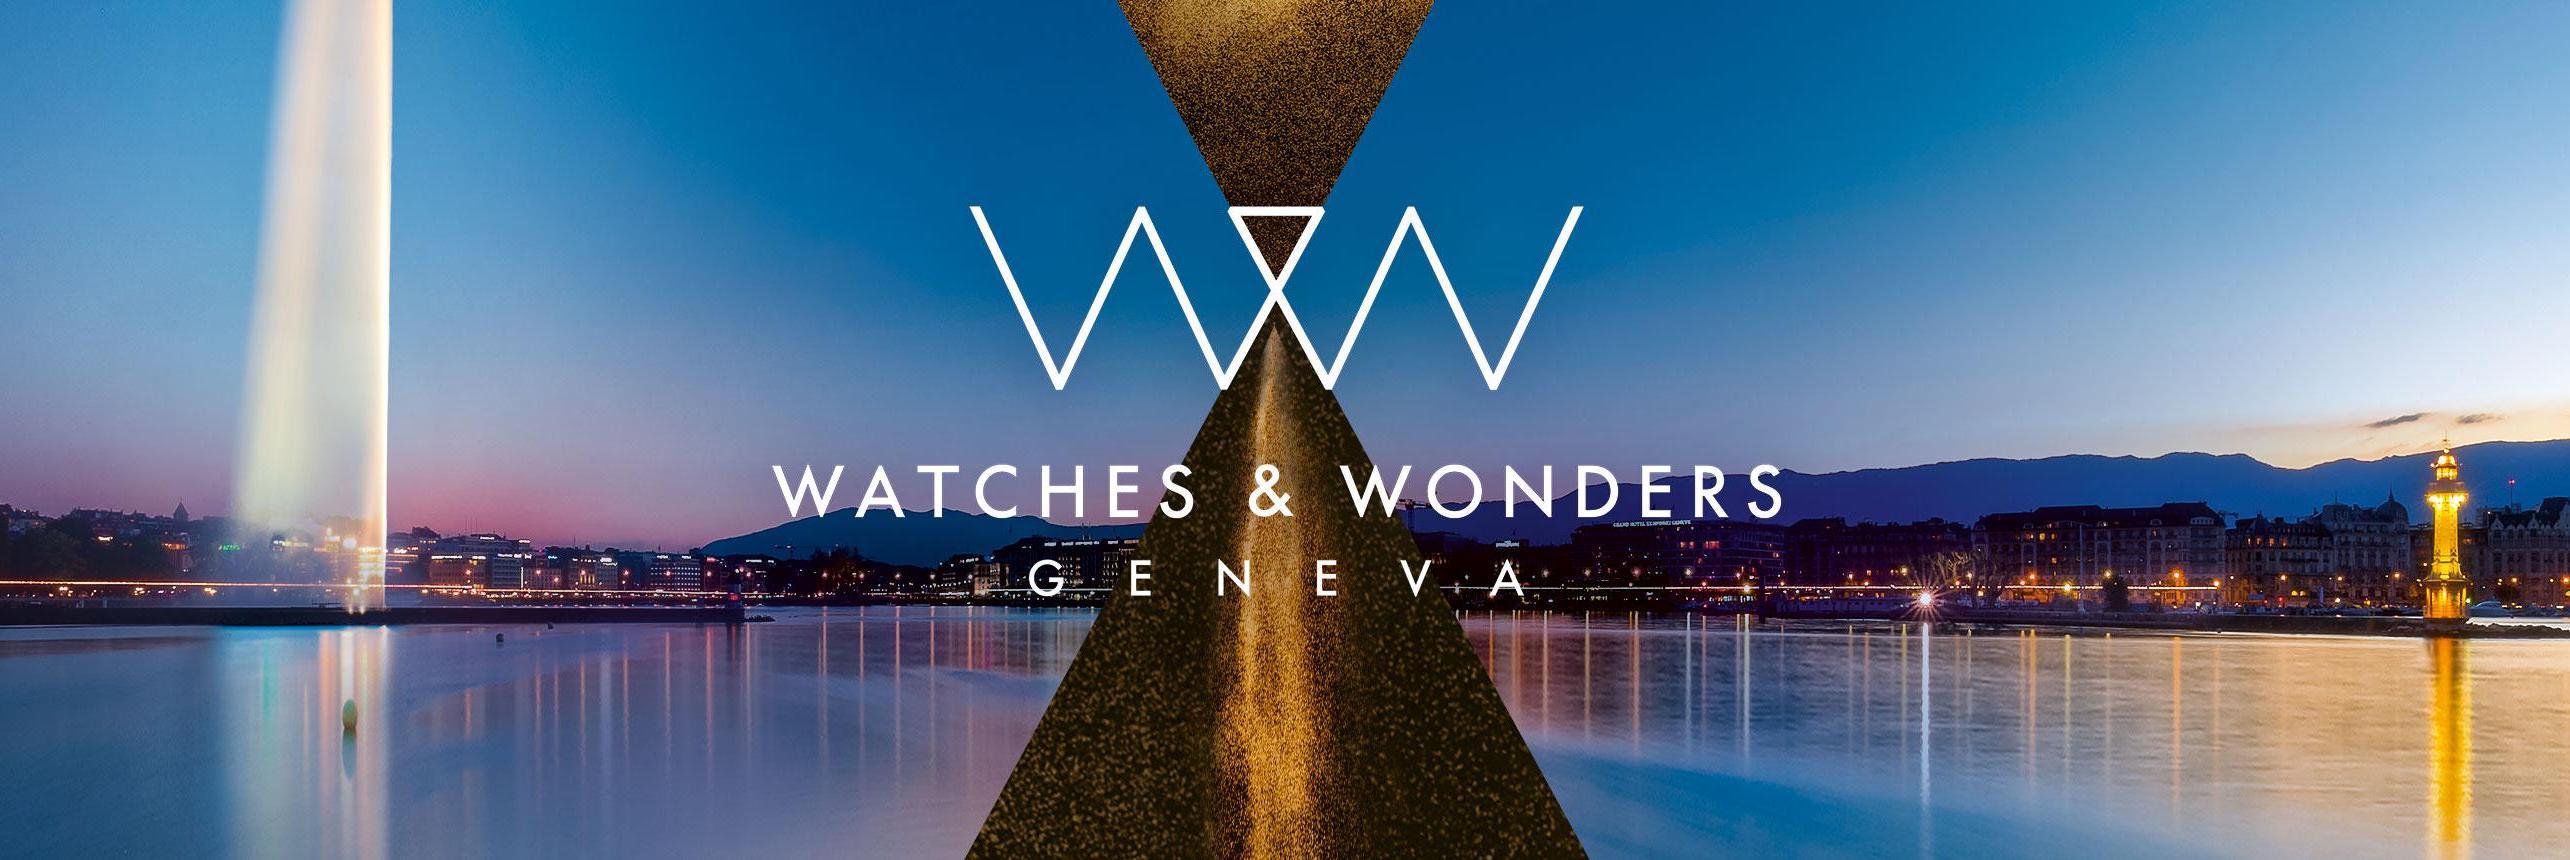 Watches & Wonders Geneva - cover